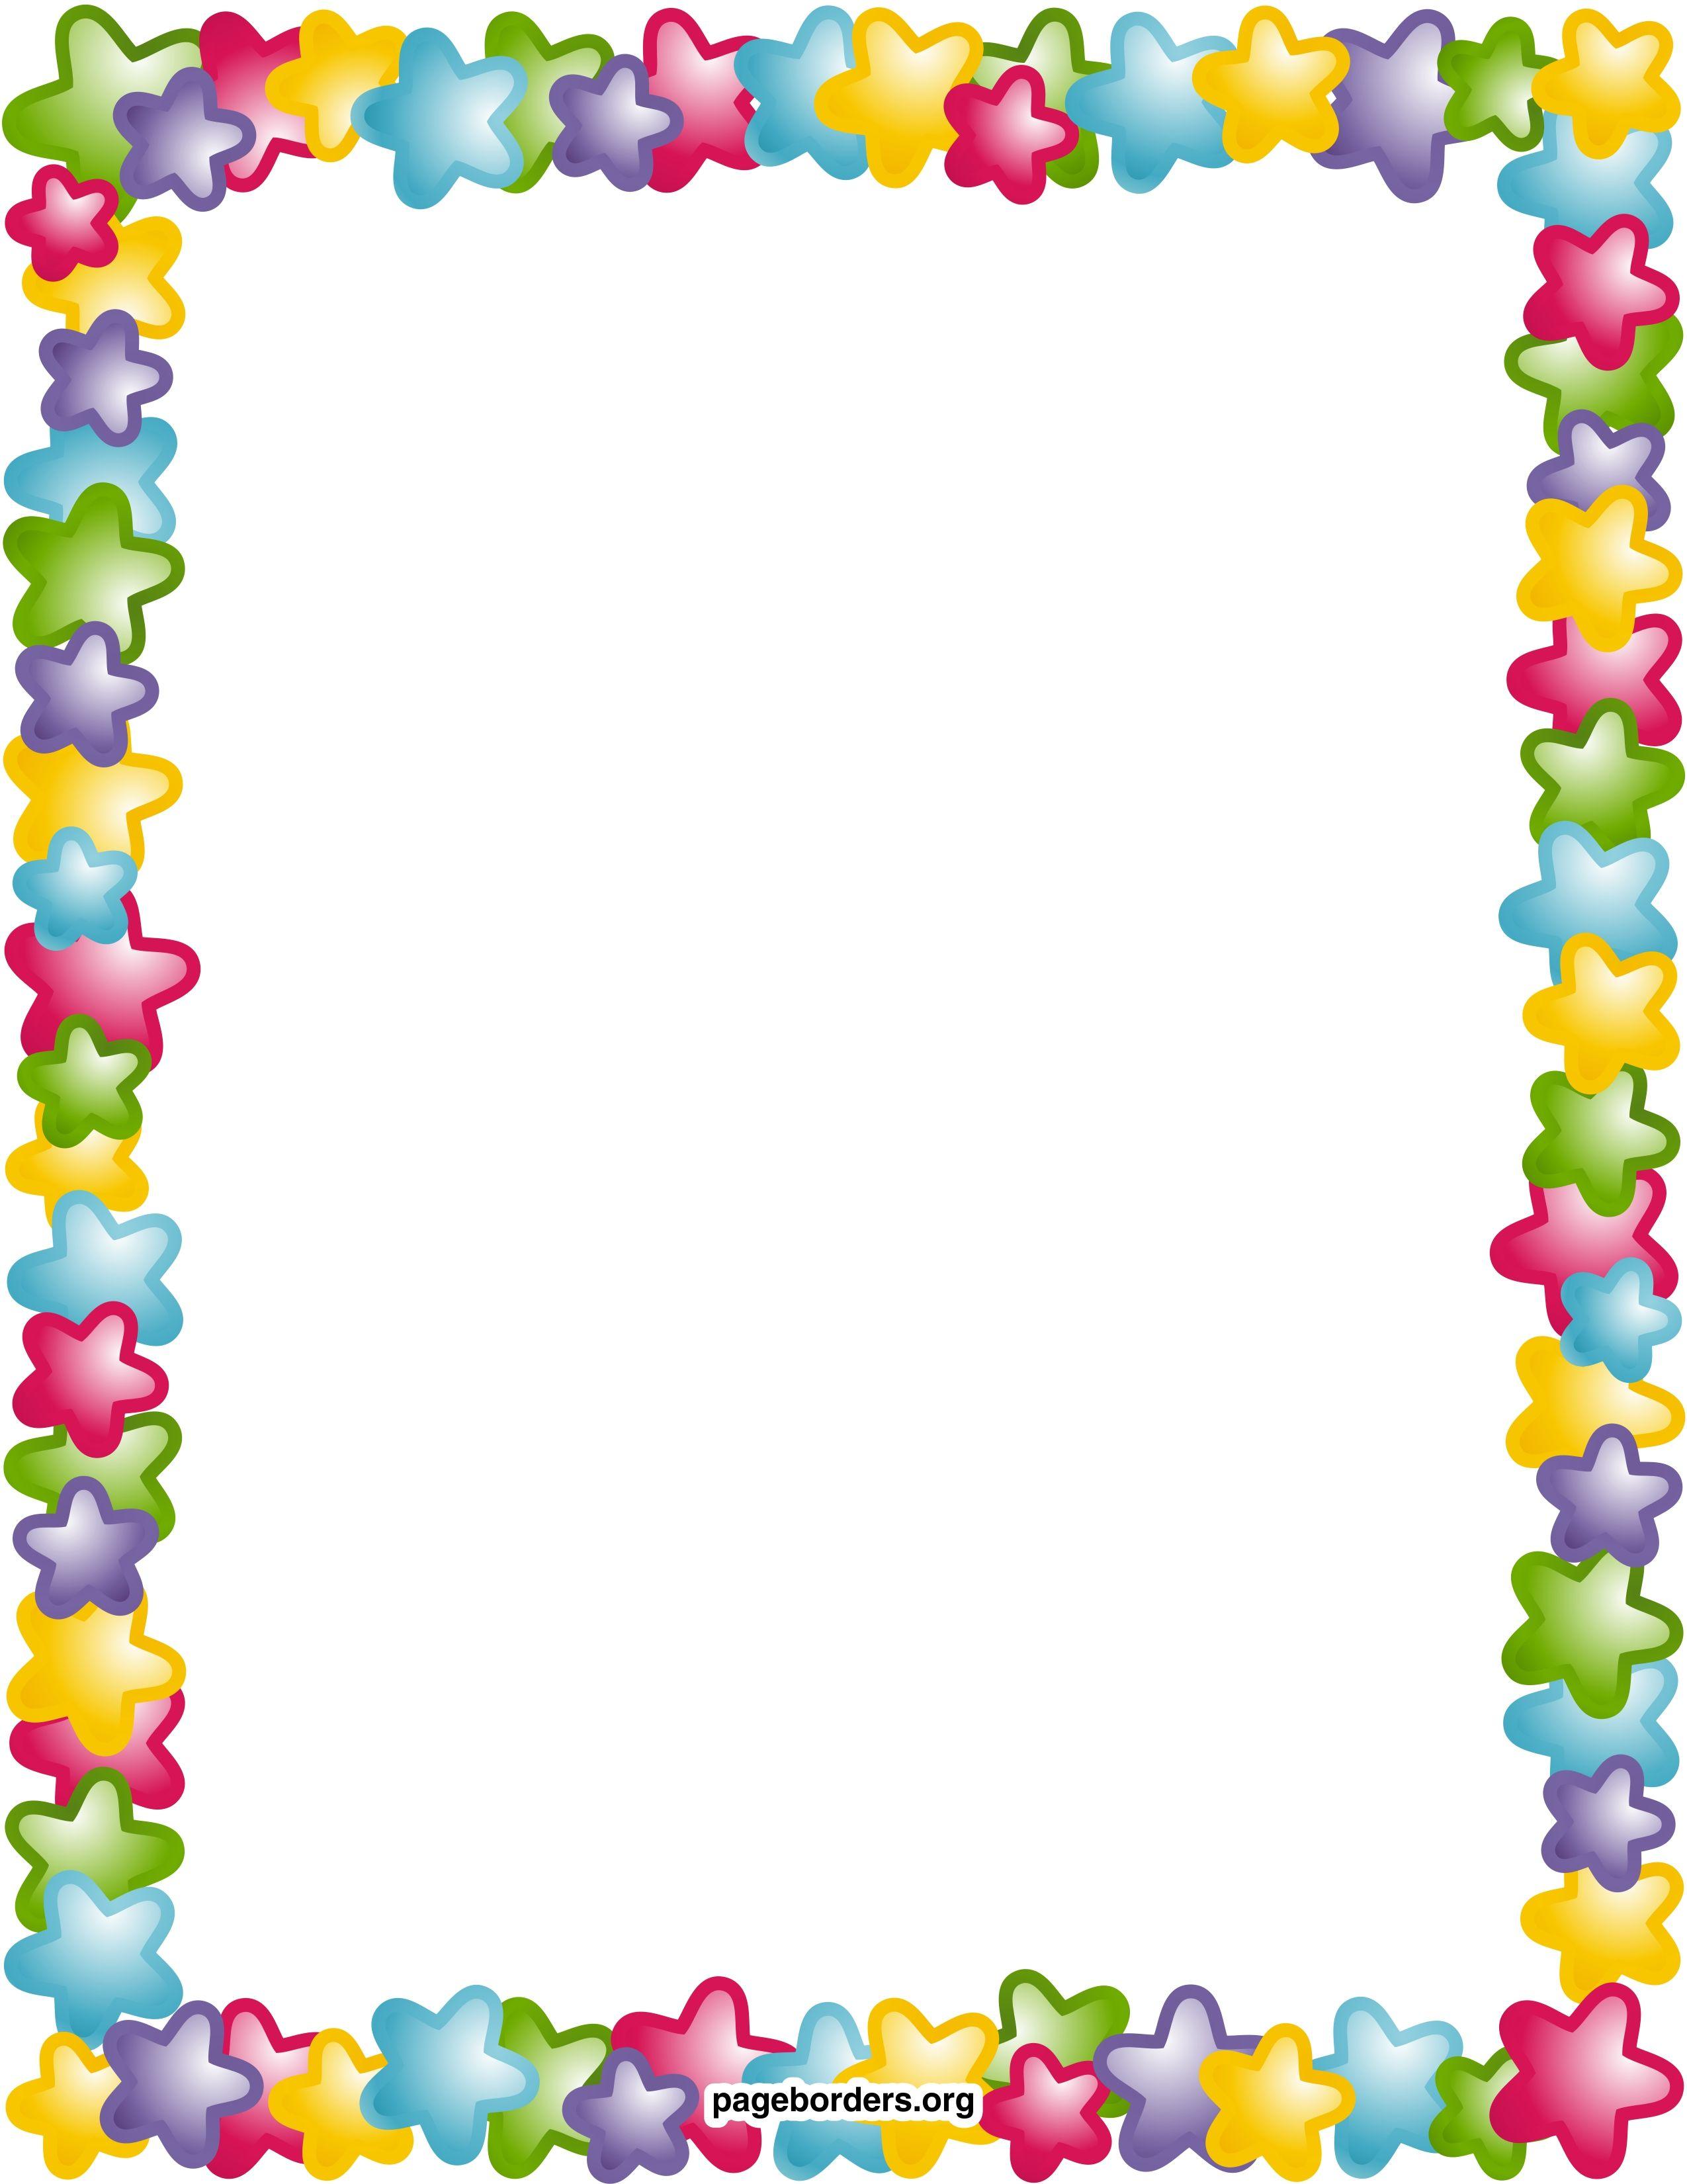 picture free Page borders clipart. Star border clip art